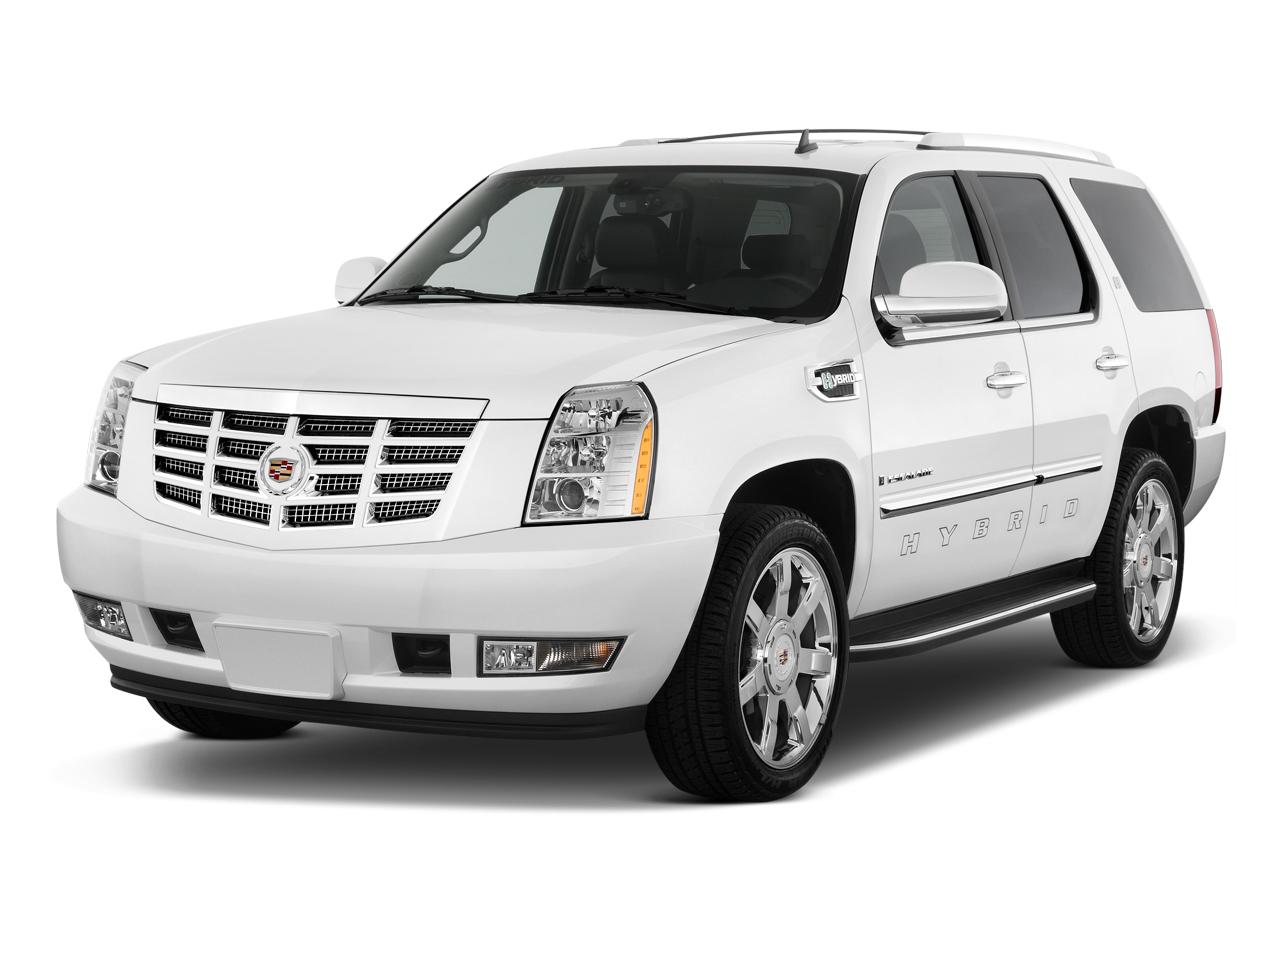 Length Of Cadillac Escalade: 2010 Cadillac Escalade Hybrid Review, Ratings, Specs